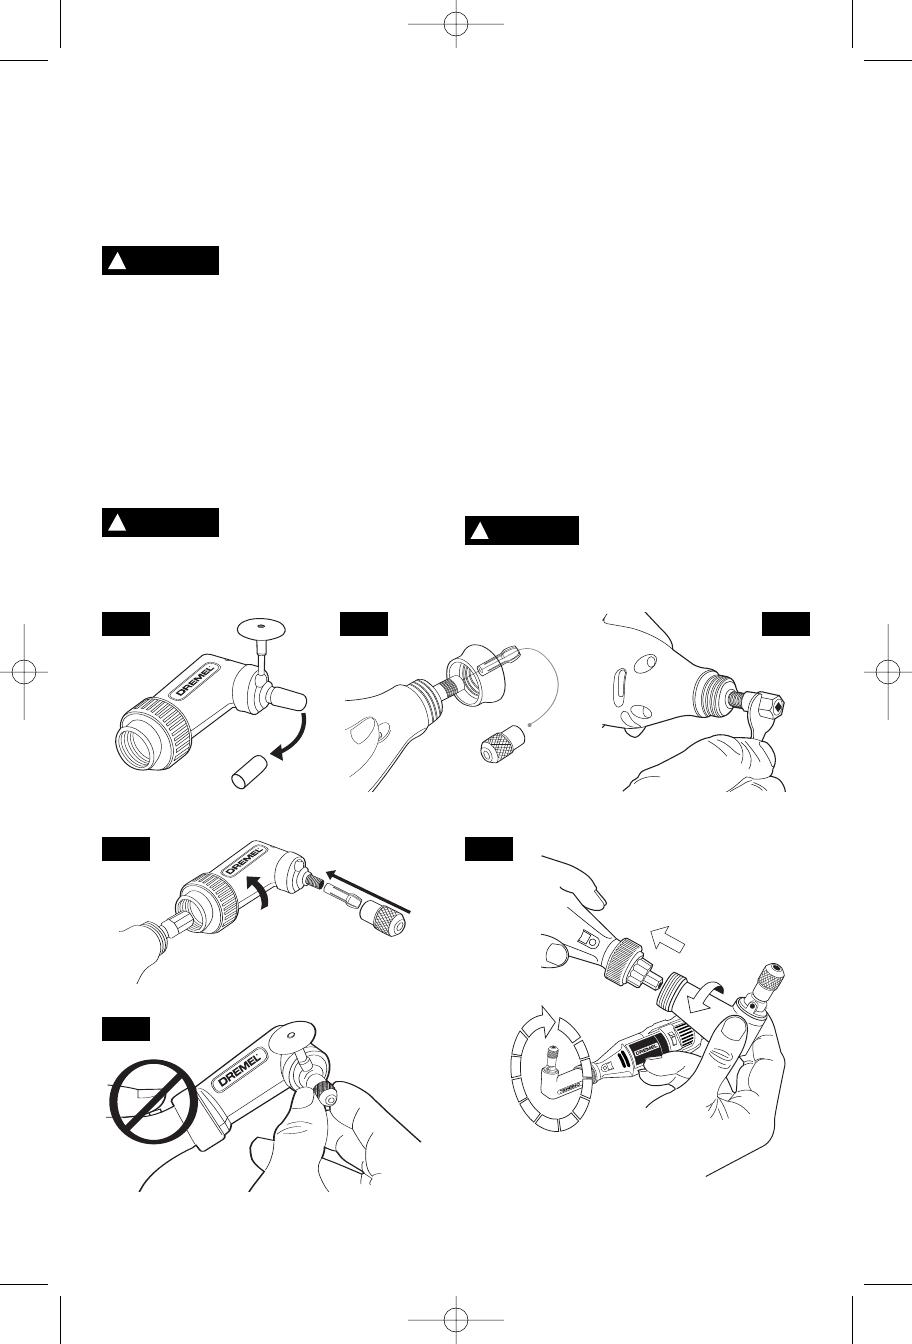 Handleiding Dremel 395t6 Pagina 15 Van 92 English Espanl Franais Wiring Diagram P